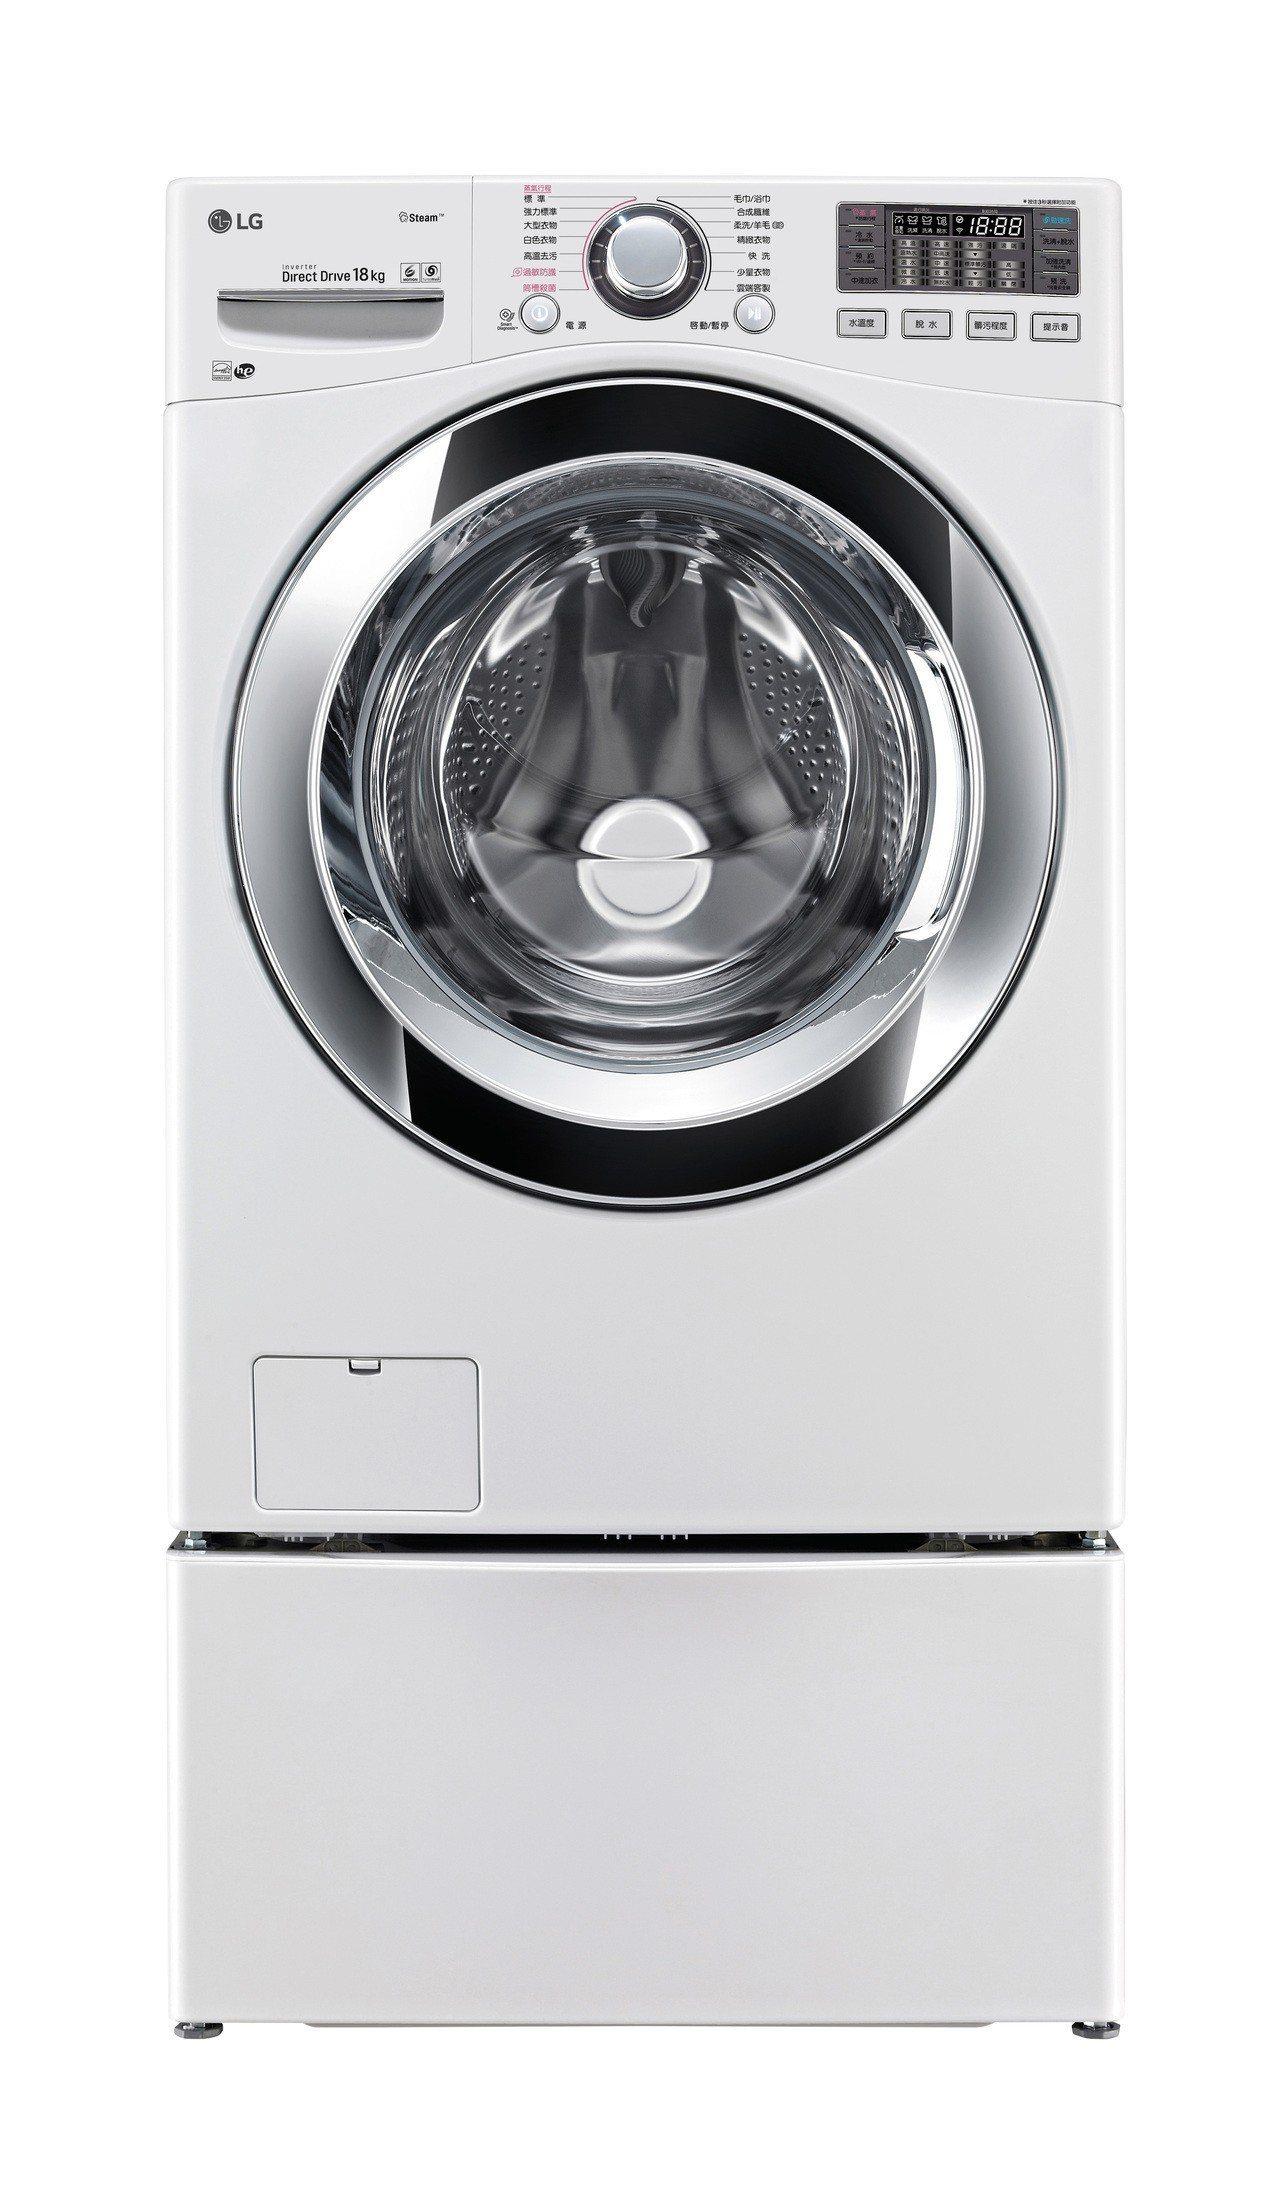 LG TWINWash雙能洗,買就送5,000元現金折價券,全國電子加碼送Fay...